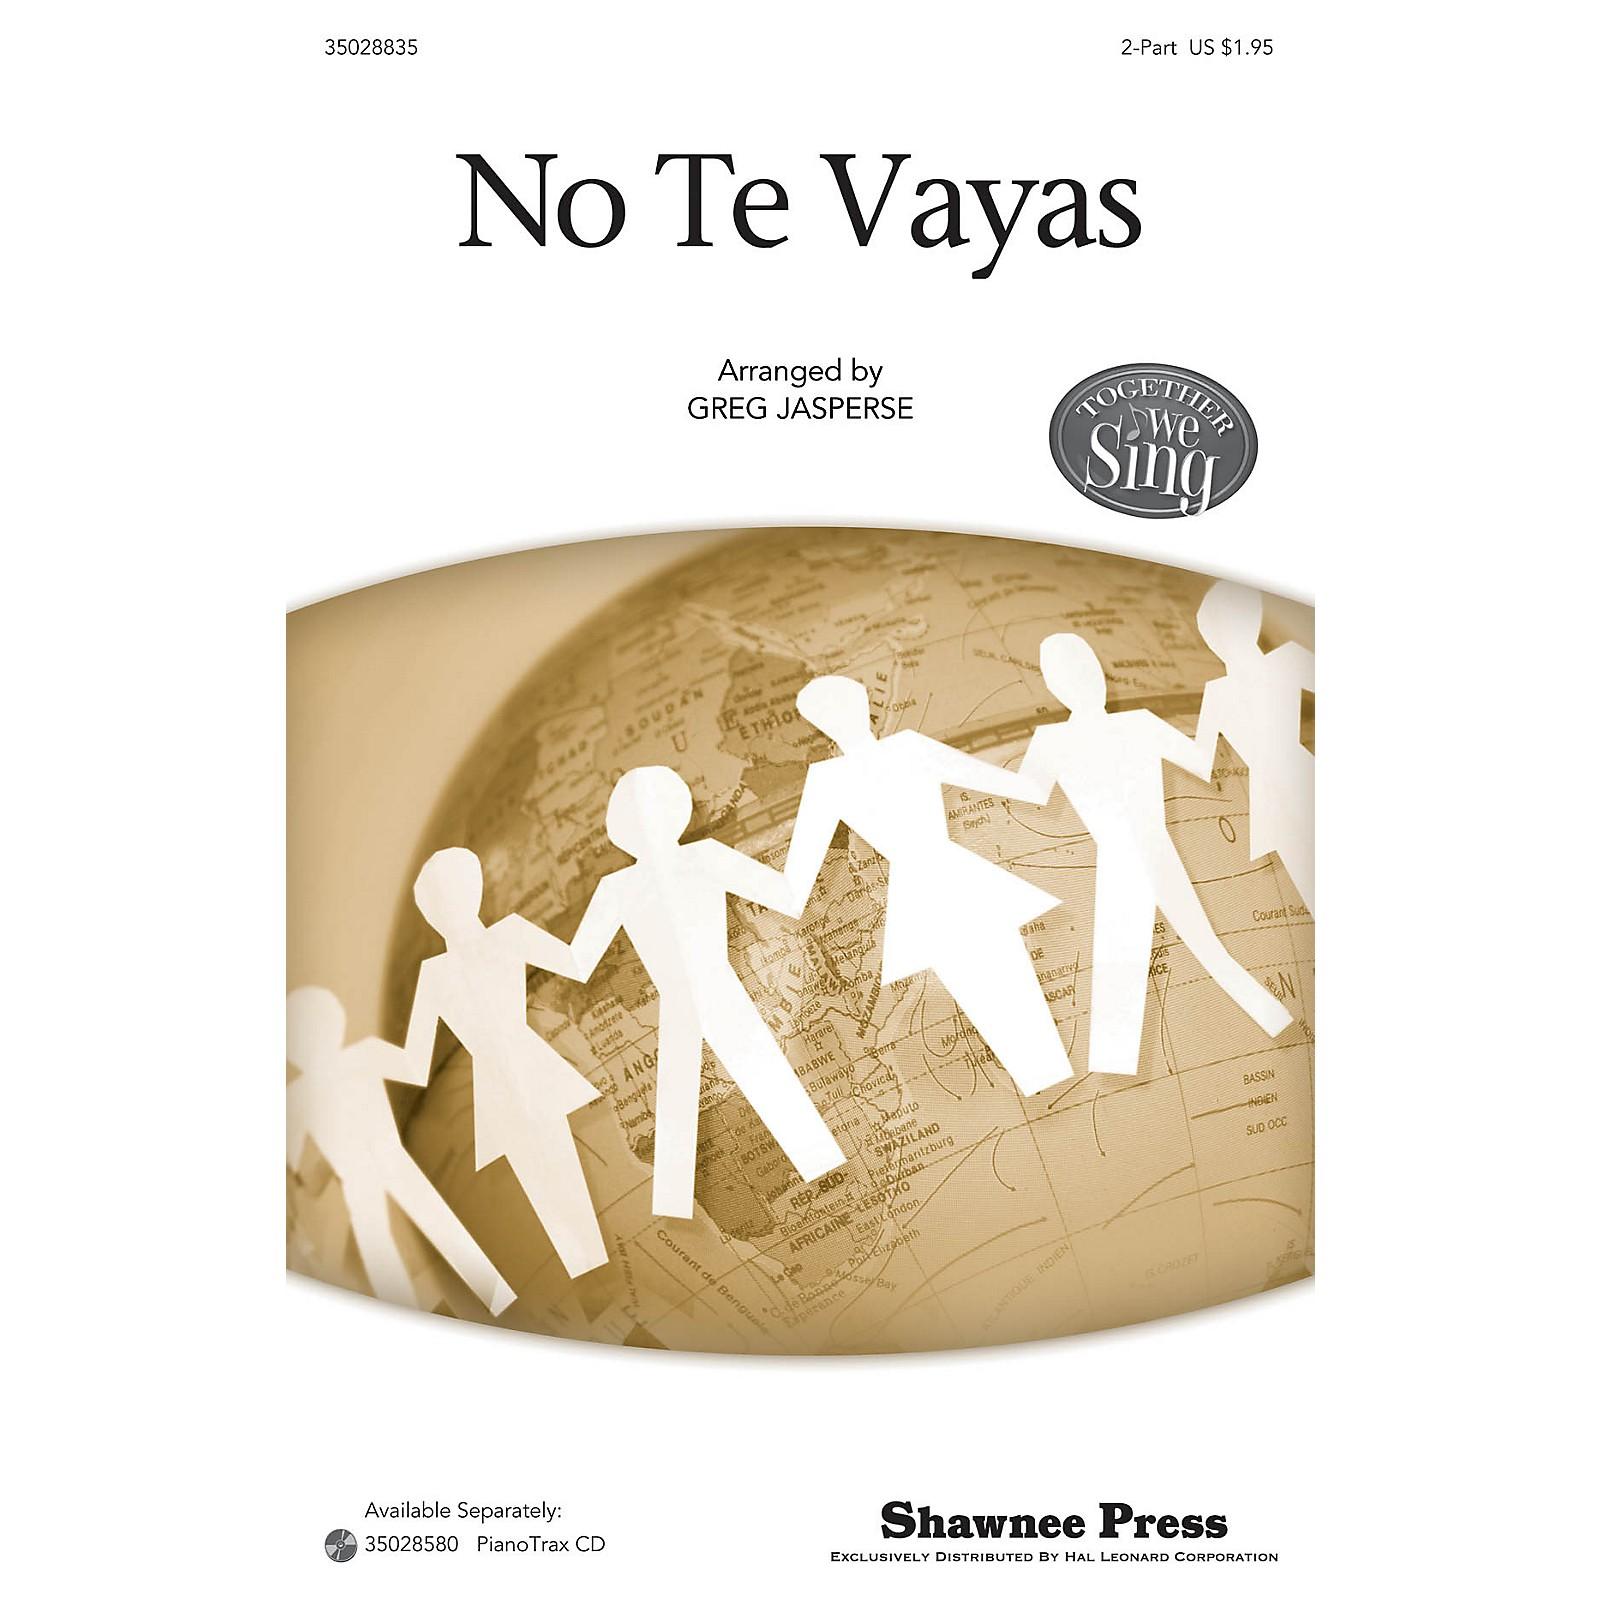 Shawnee Press No Te Vayas (Together We Sing Series) 2-Part arranged by Greg Jasperse